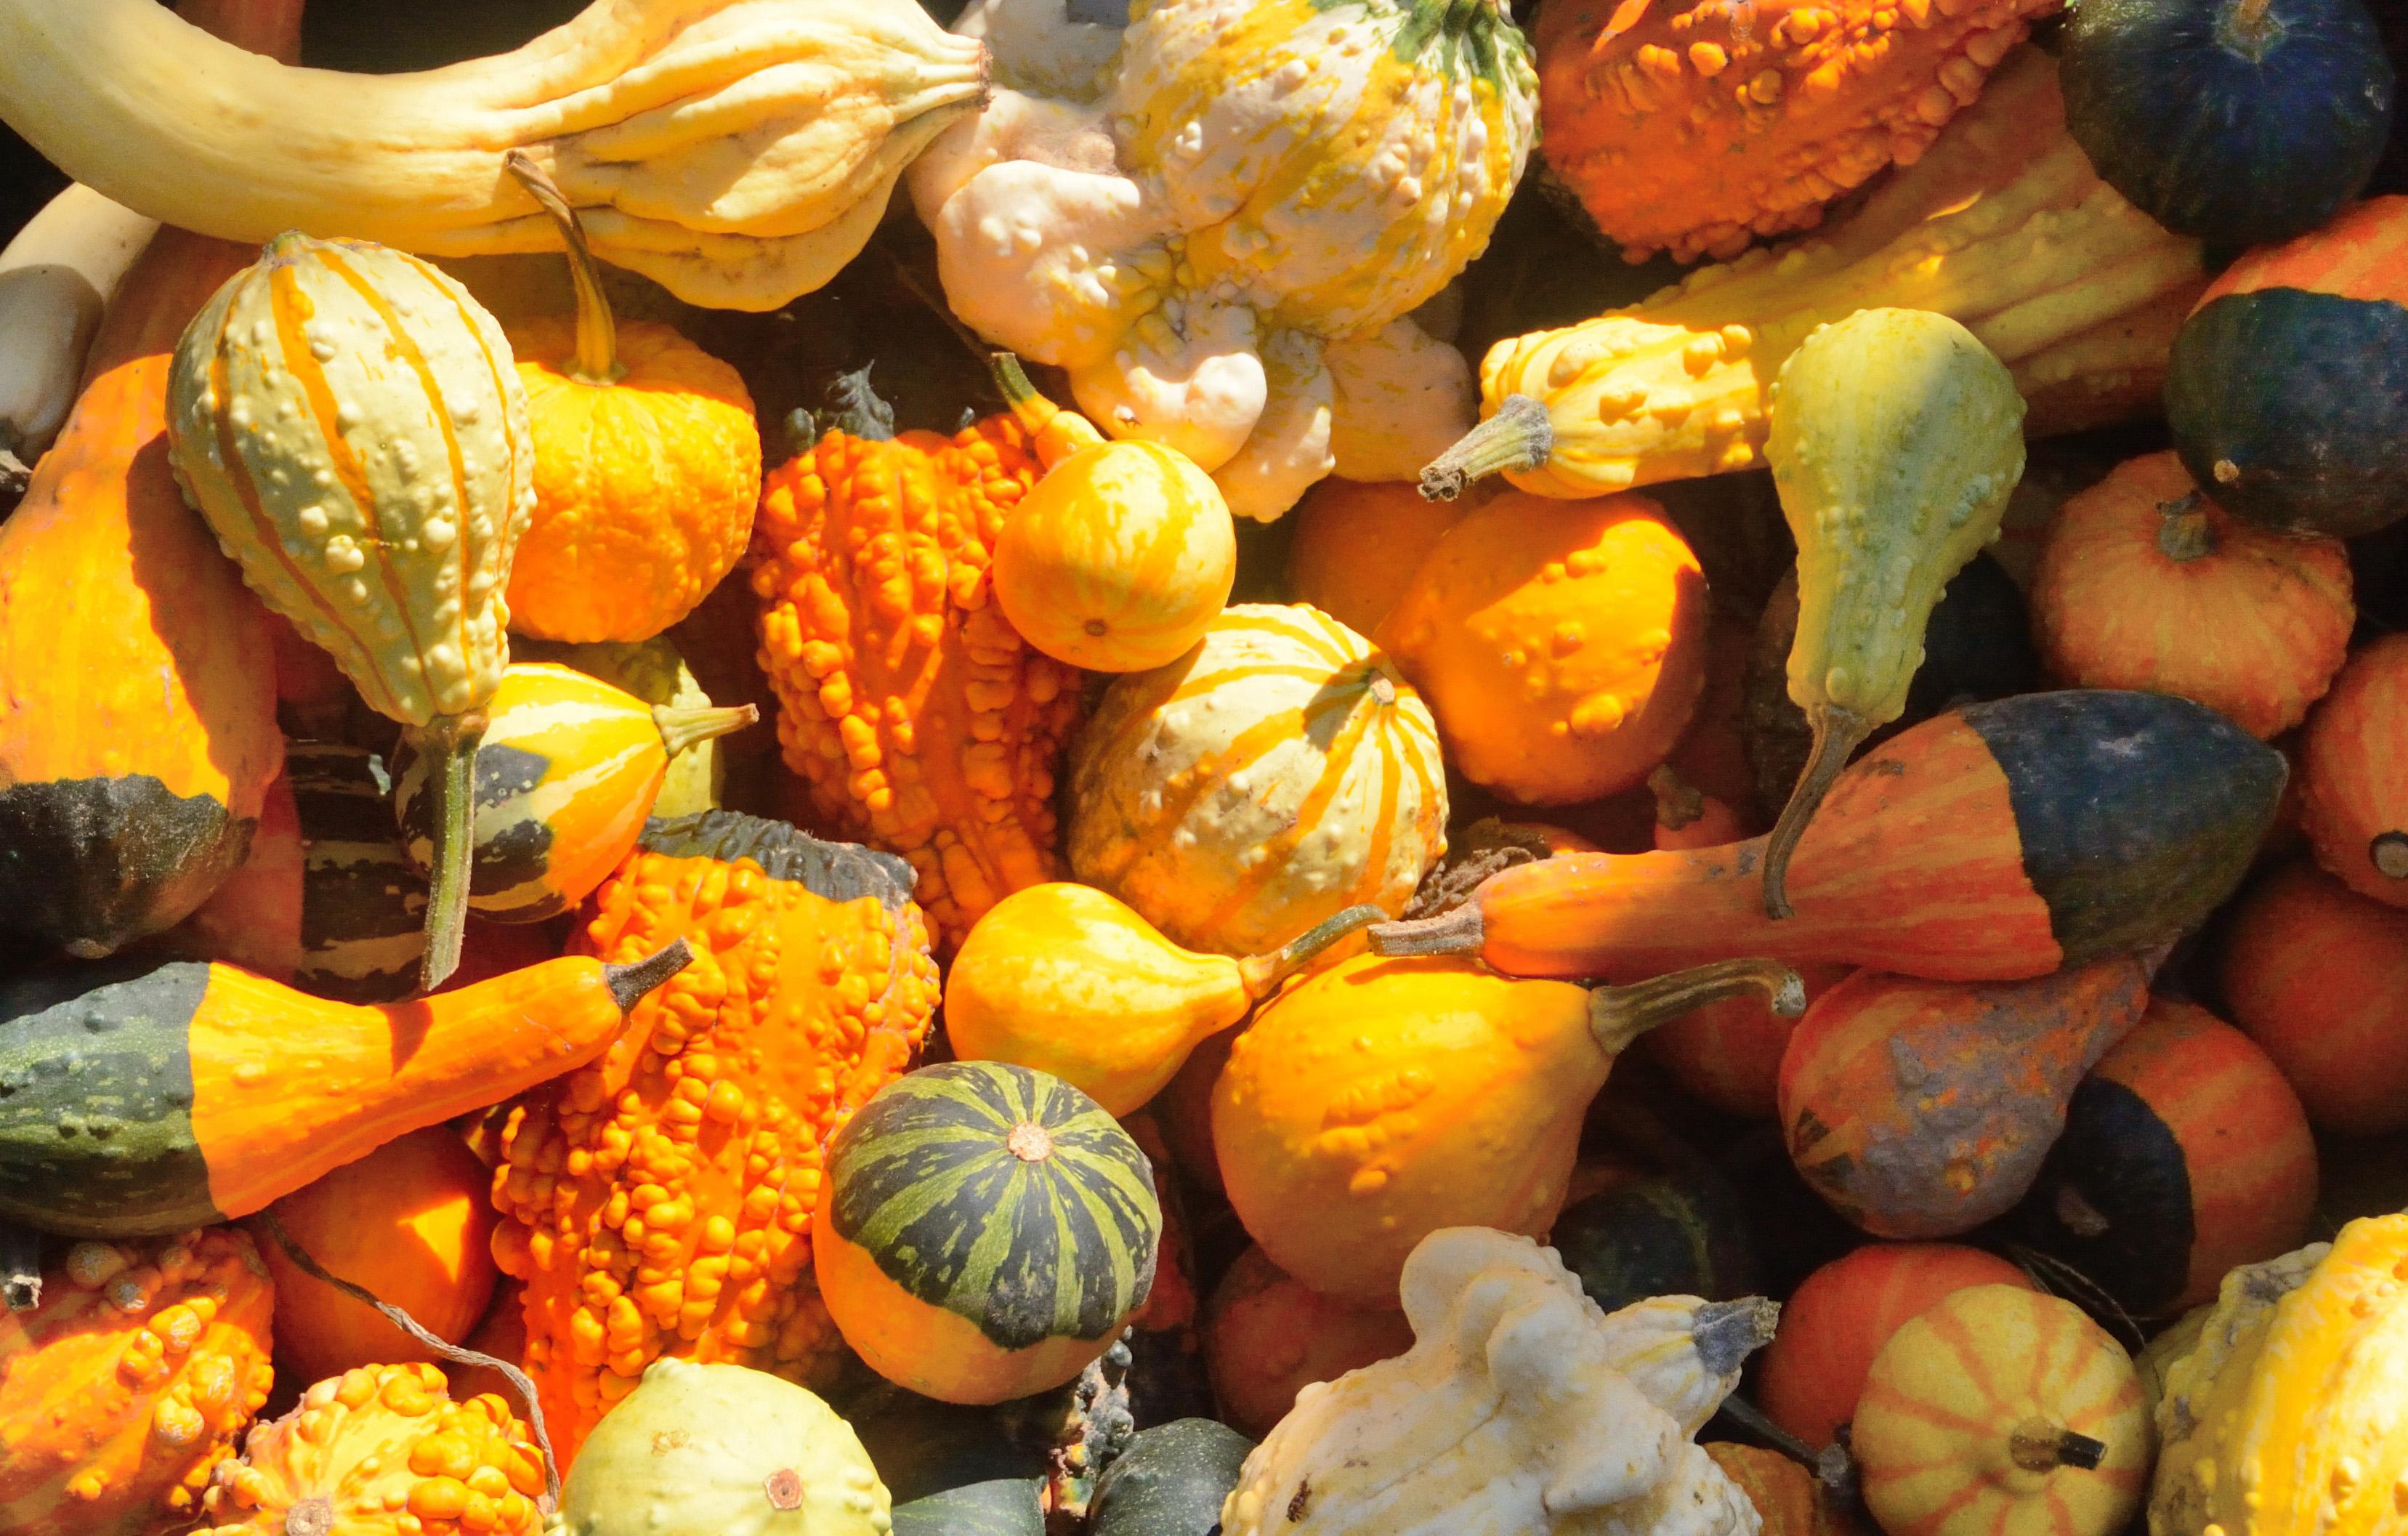 Squash and pumpkins photo